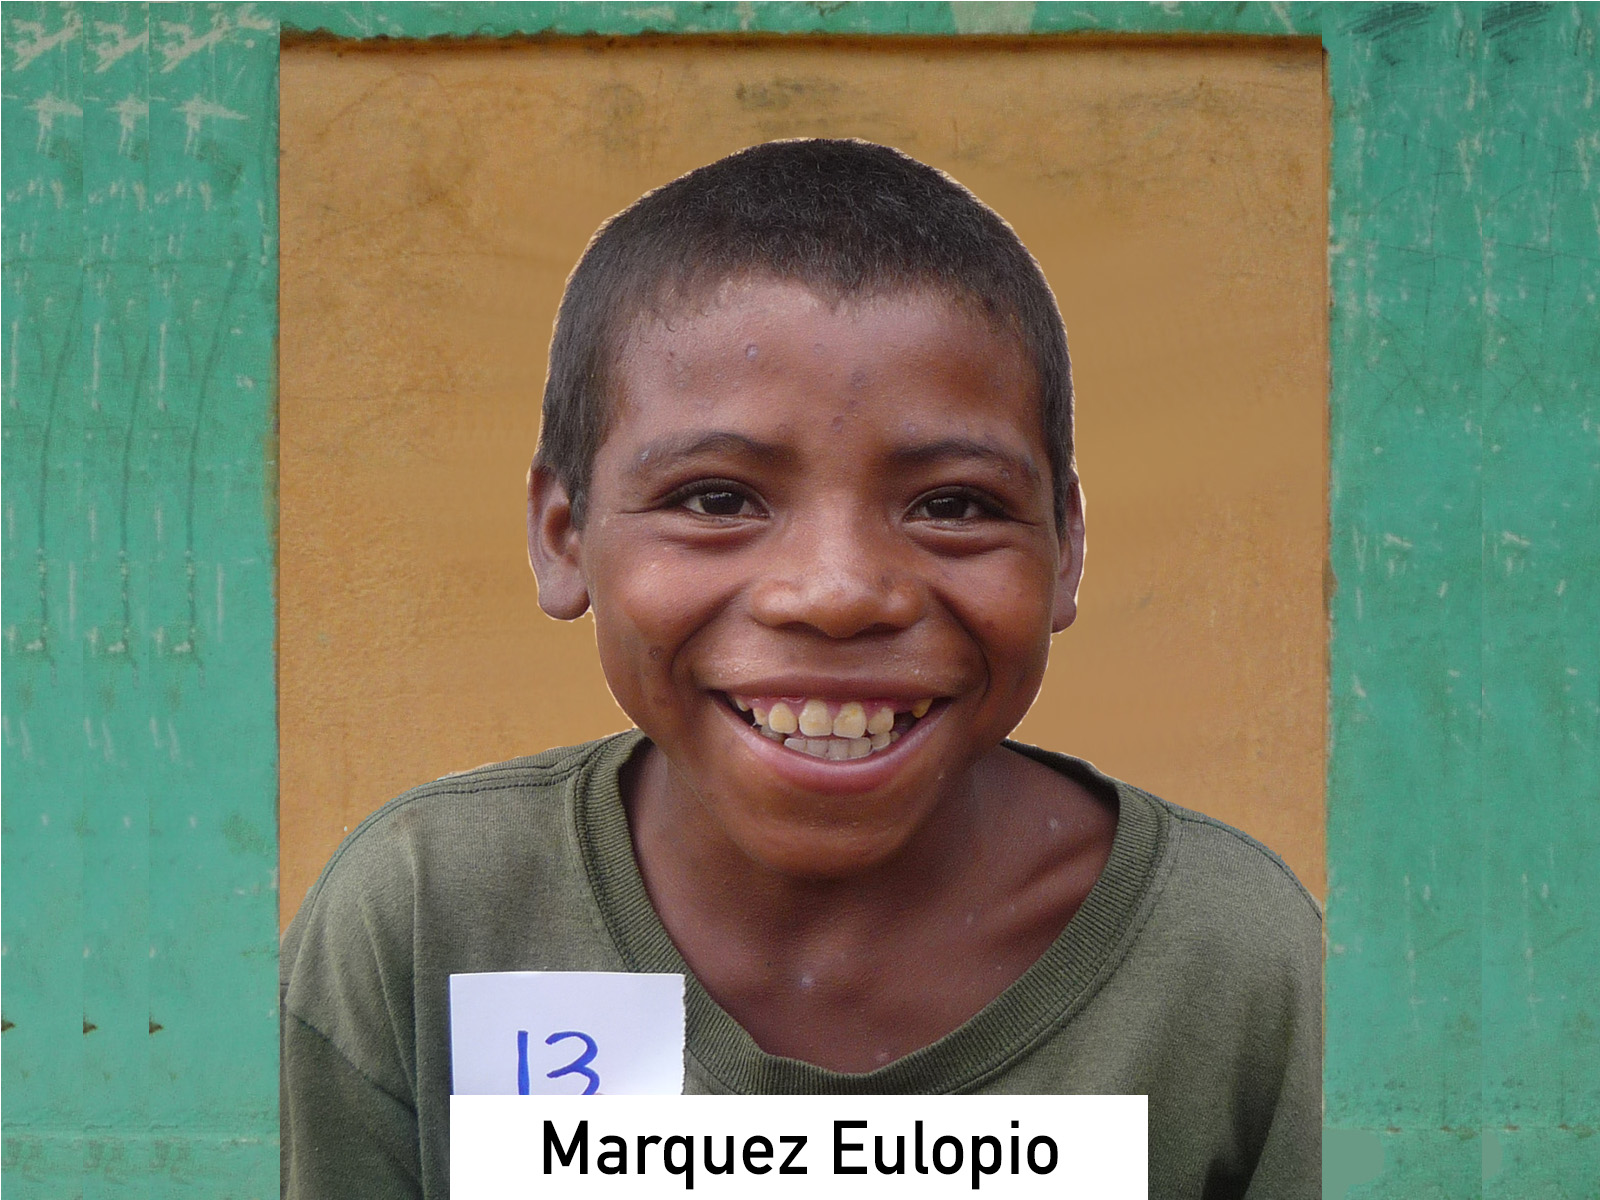 013 - Marquez Eulopio.jpg